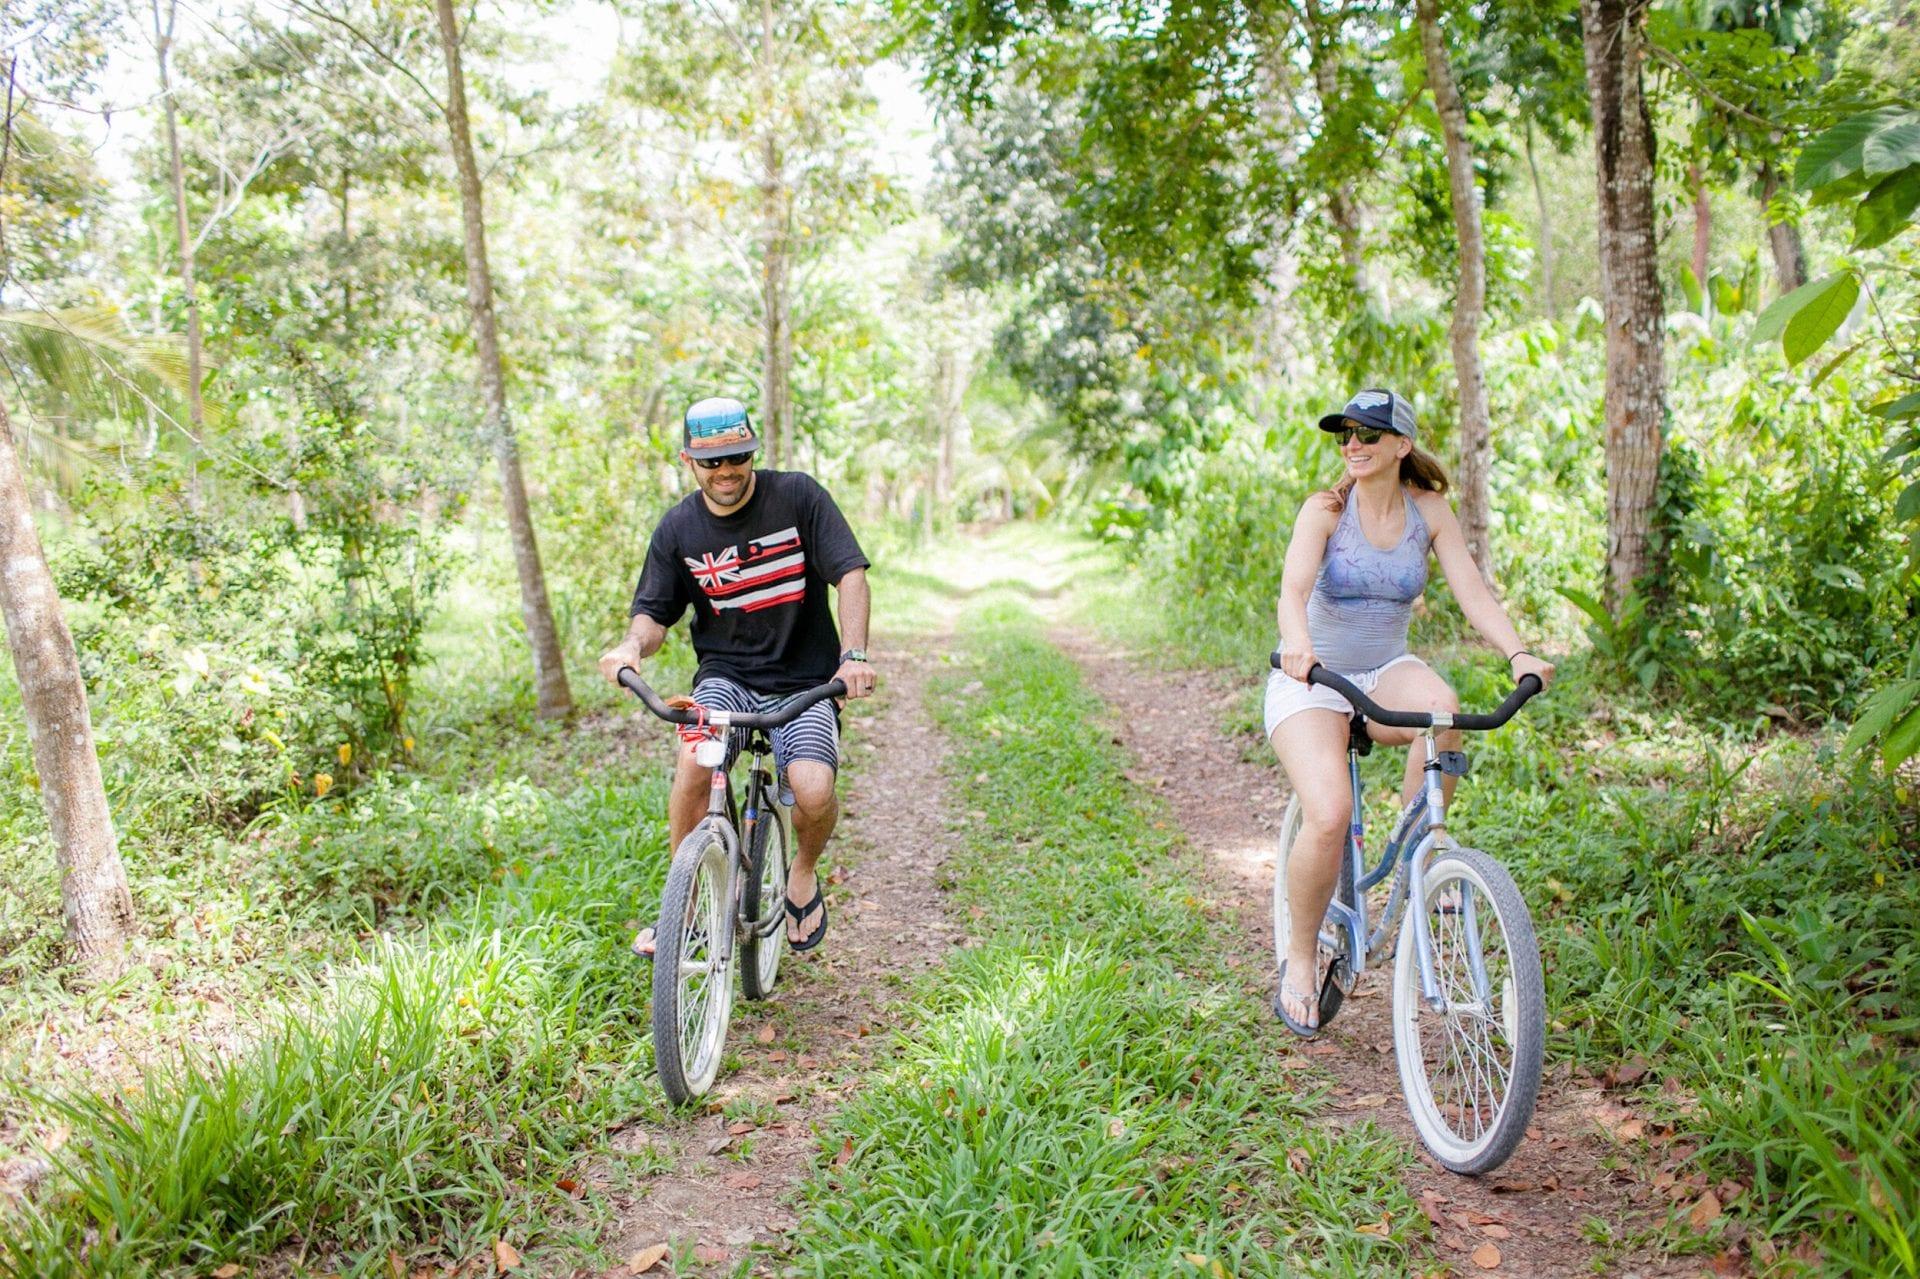 Bikes UK Brits Copal Tree lodge belize